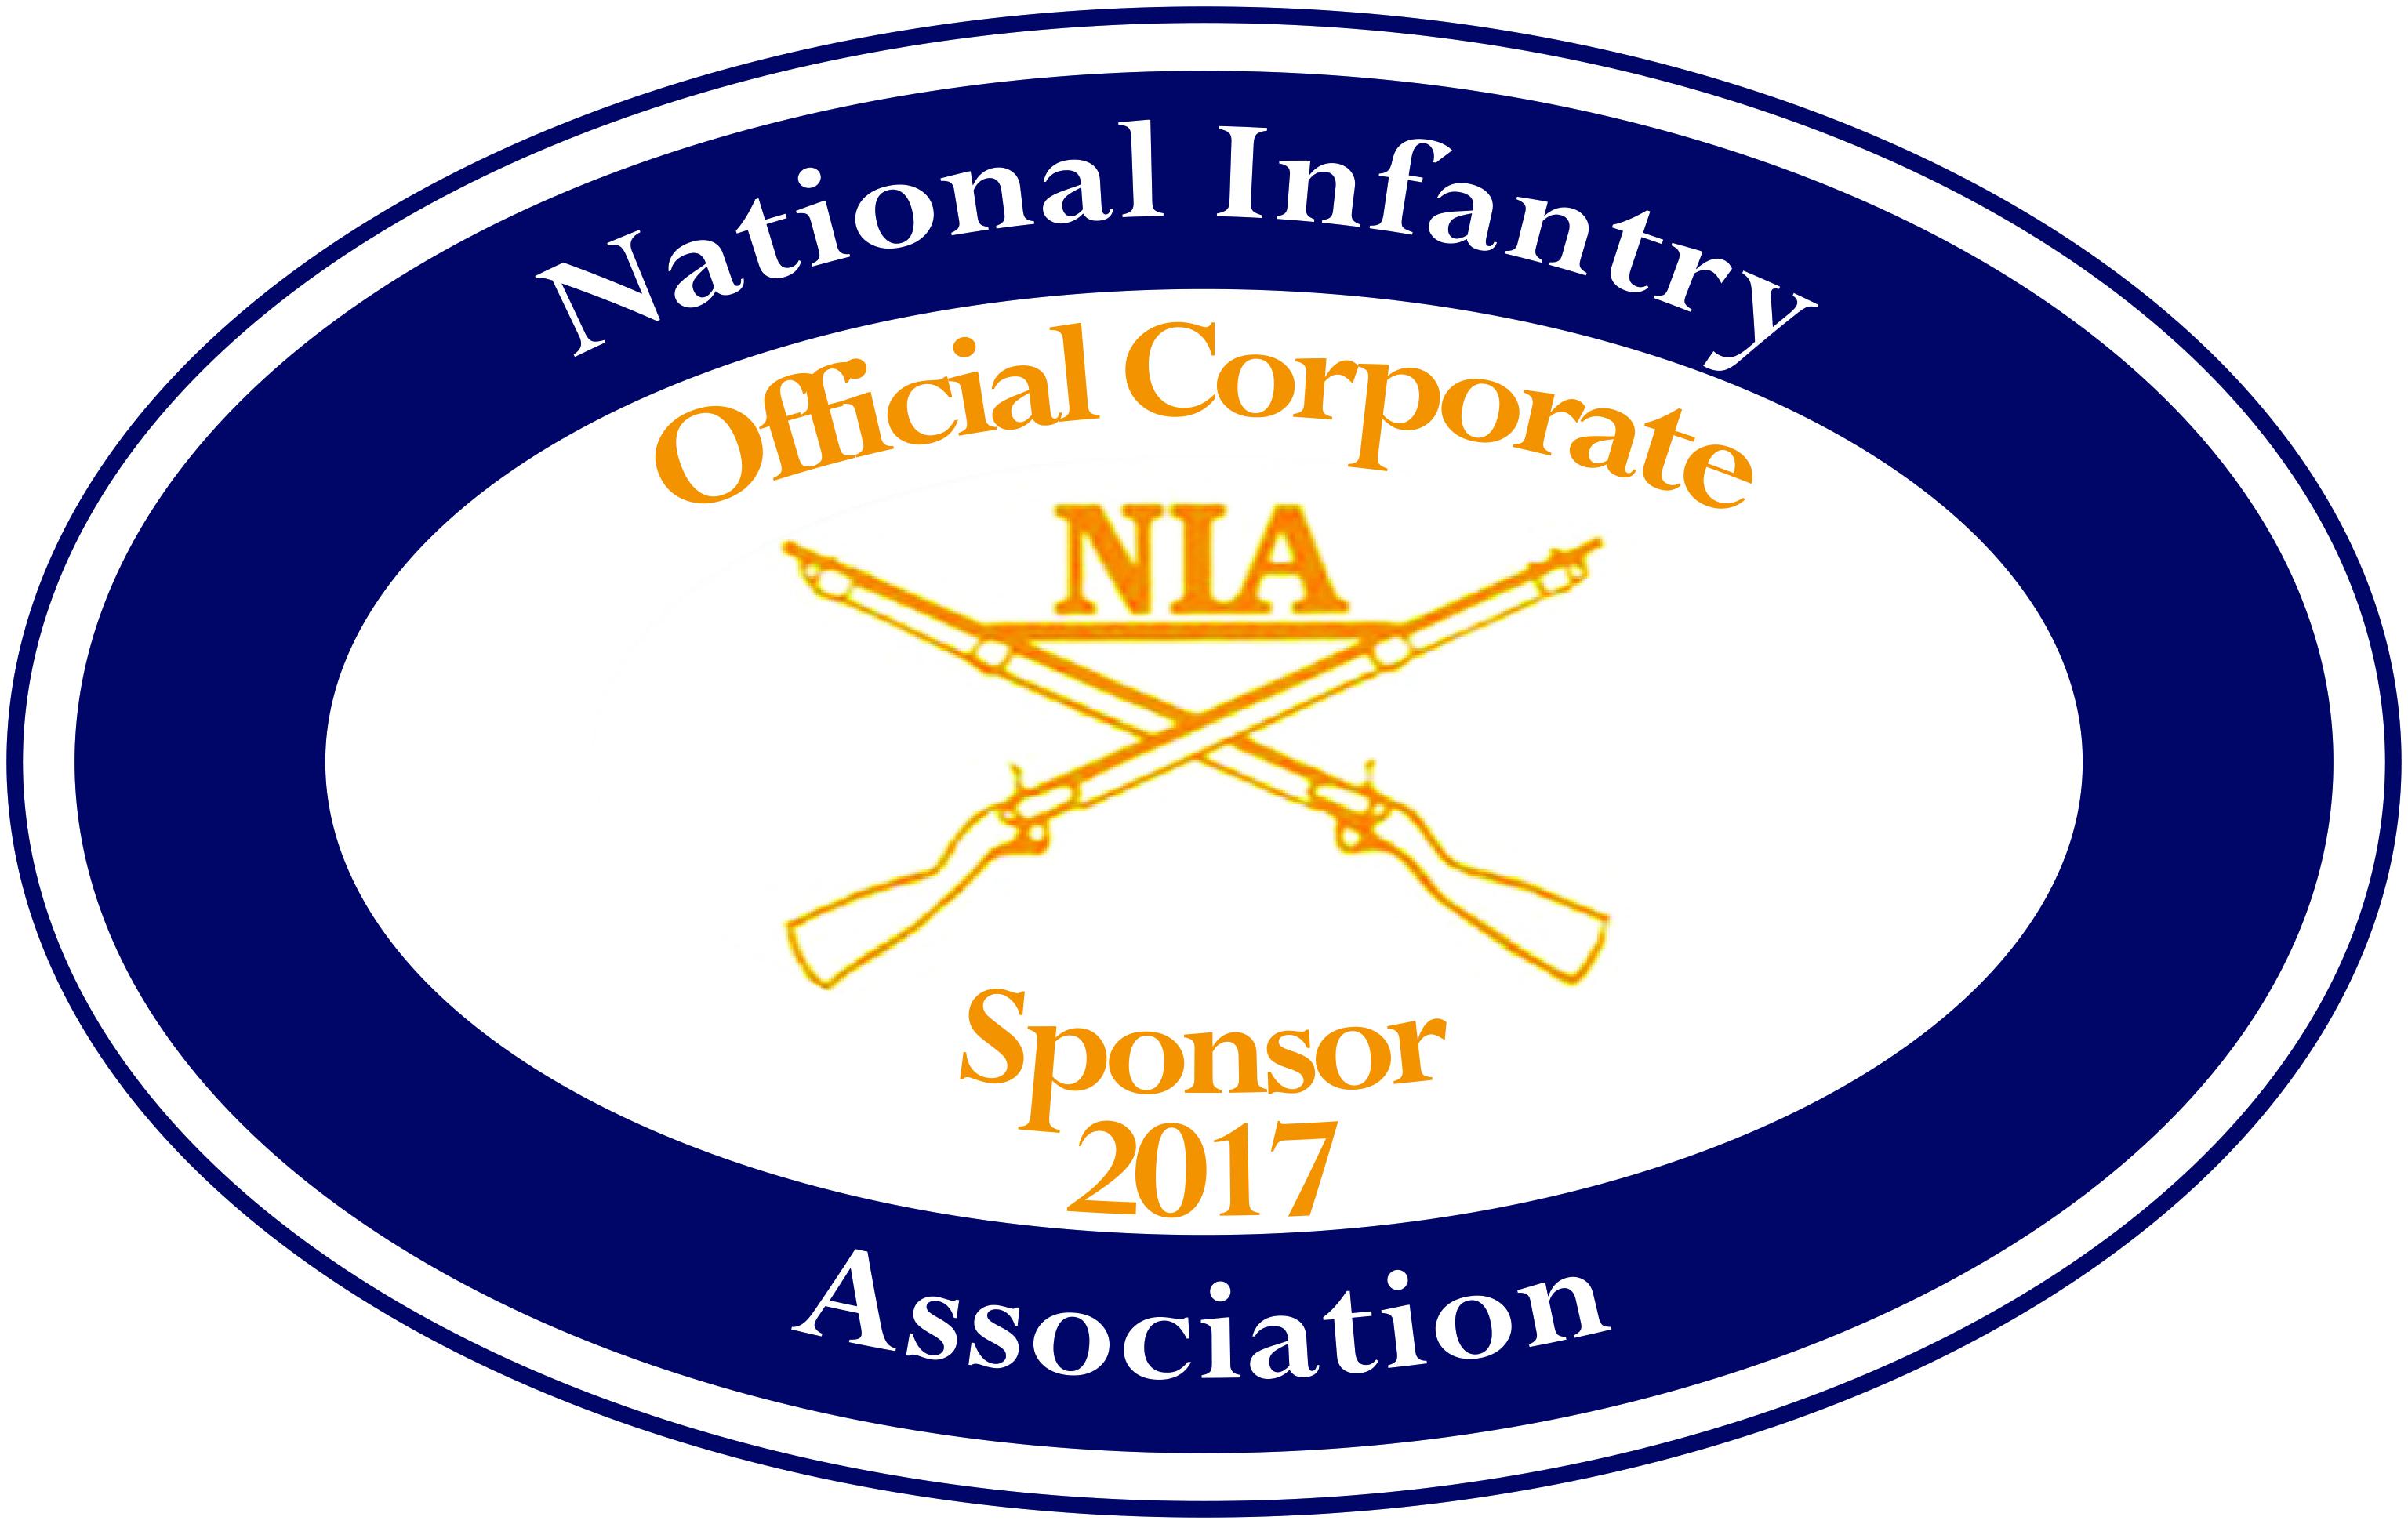 nia-logo-official-corporate-sponsor-2017.jpg